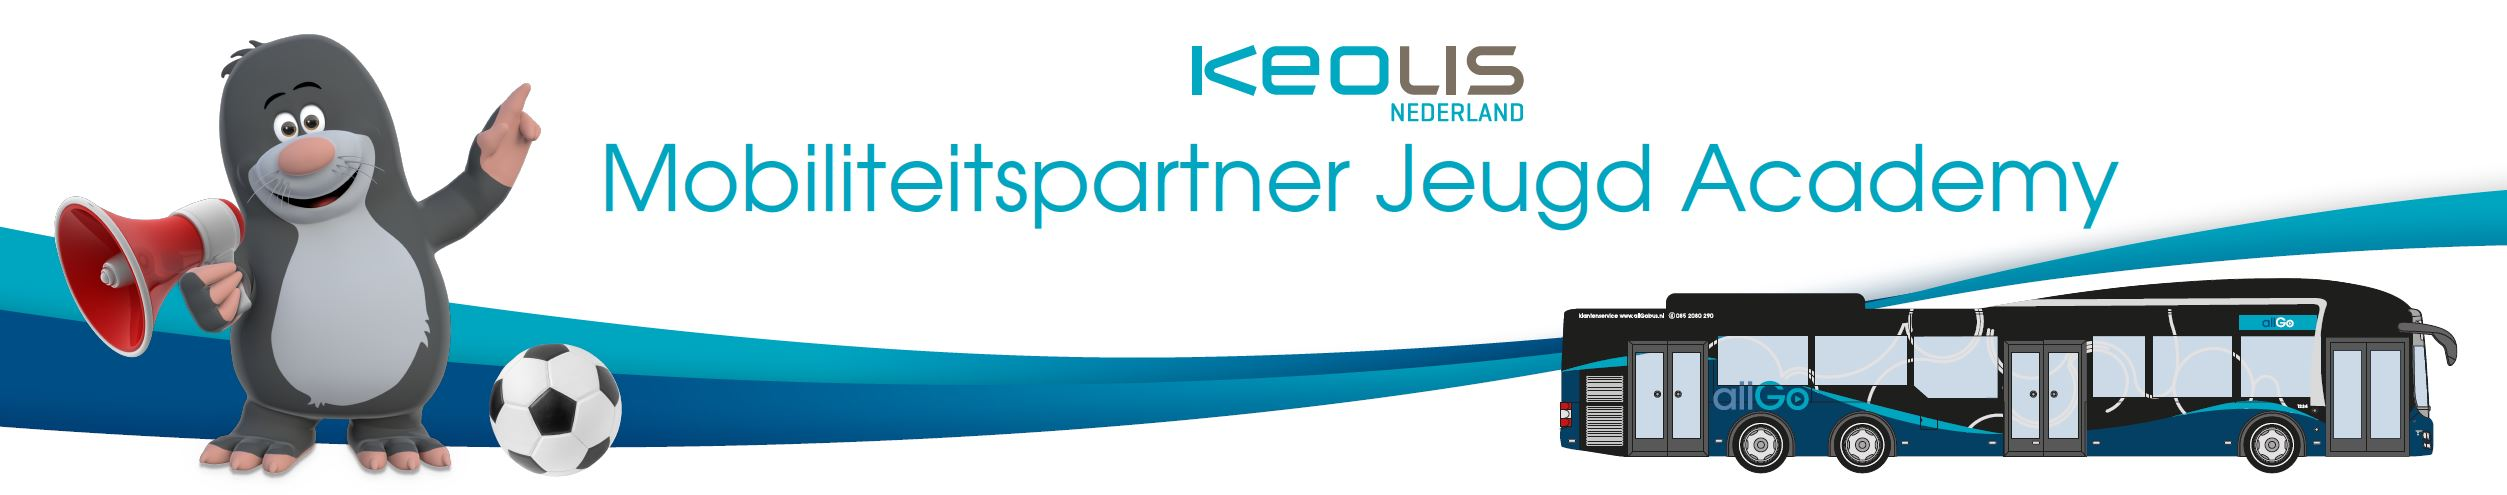 KEOLIS Banner